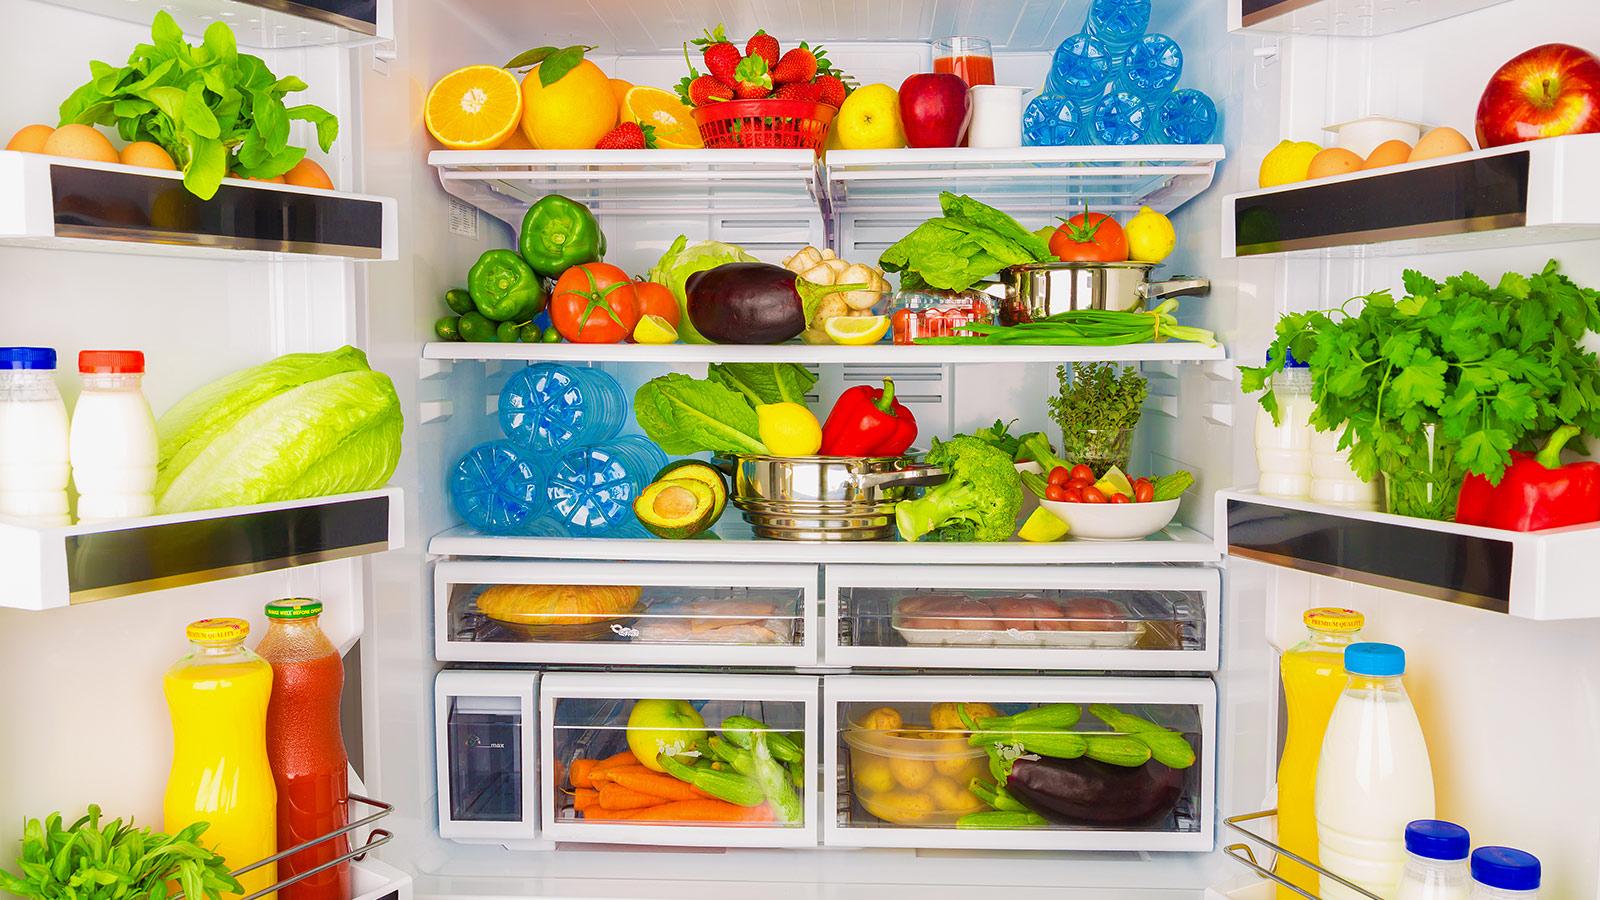 This communal fridge is pretty damn amazing | Grist